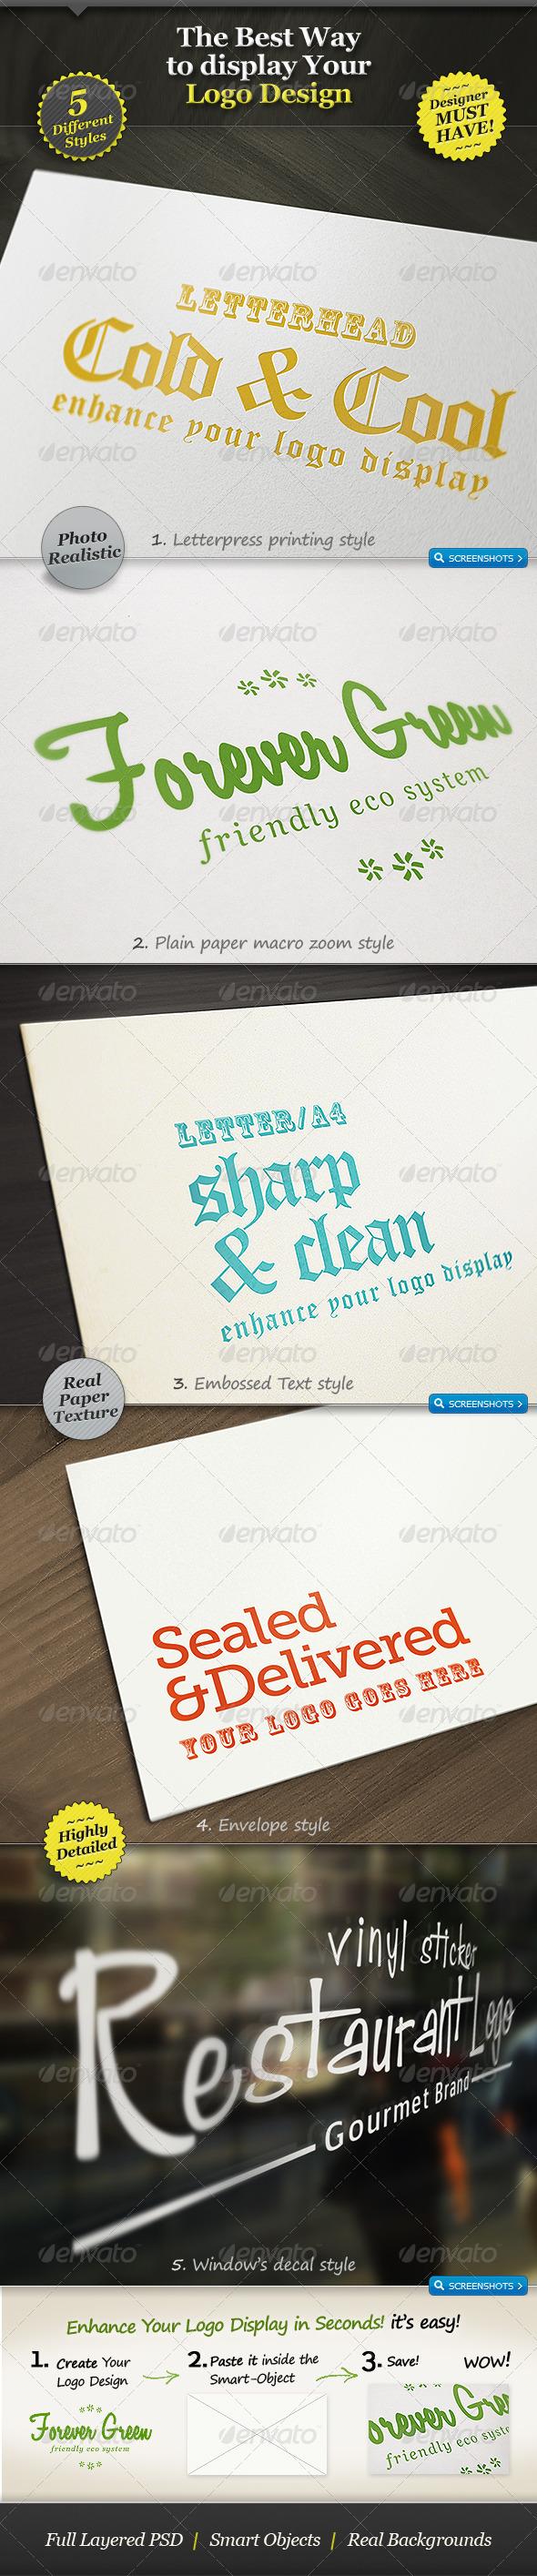 5 Realistic Logo Mockups - Smart Template Display - Logo Product Mock-Ups